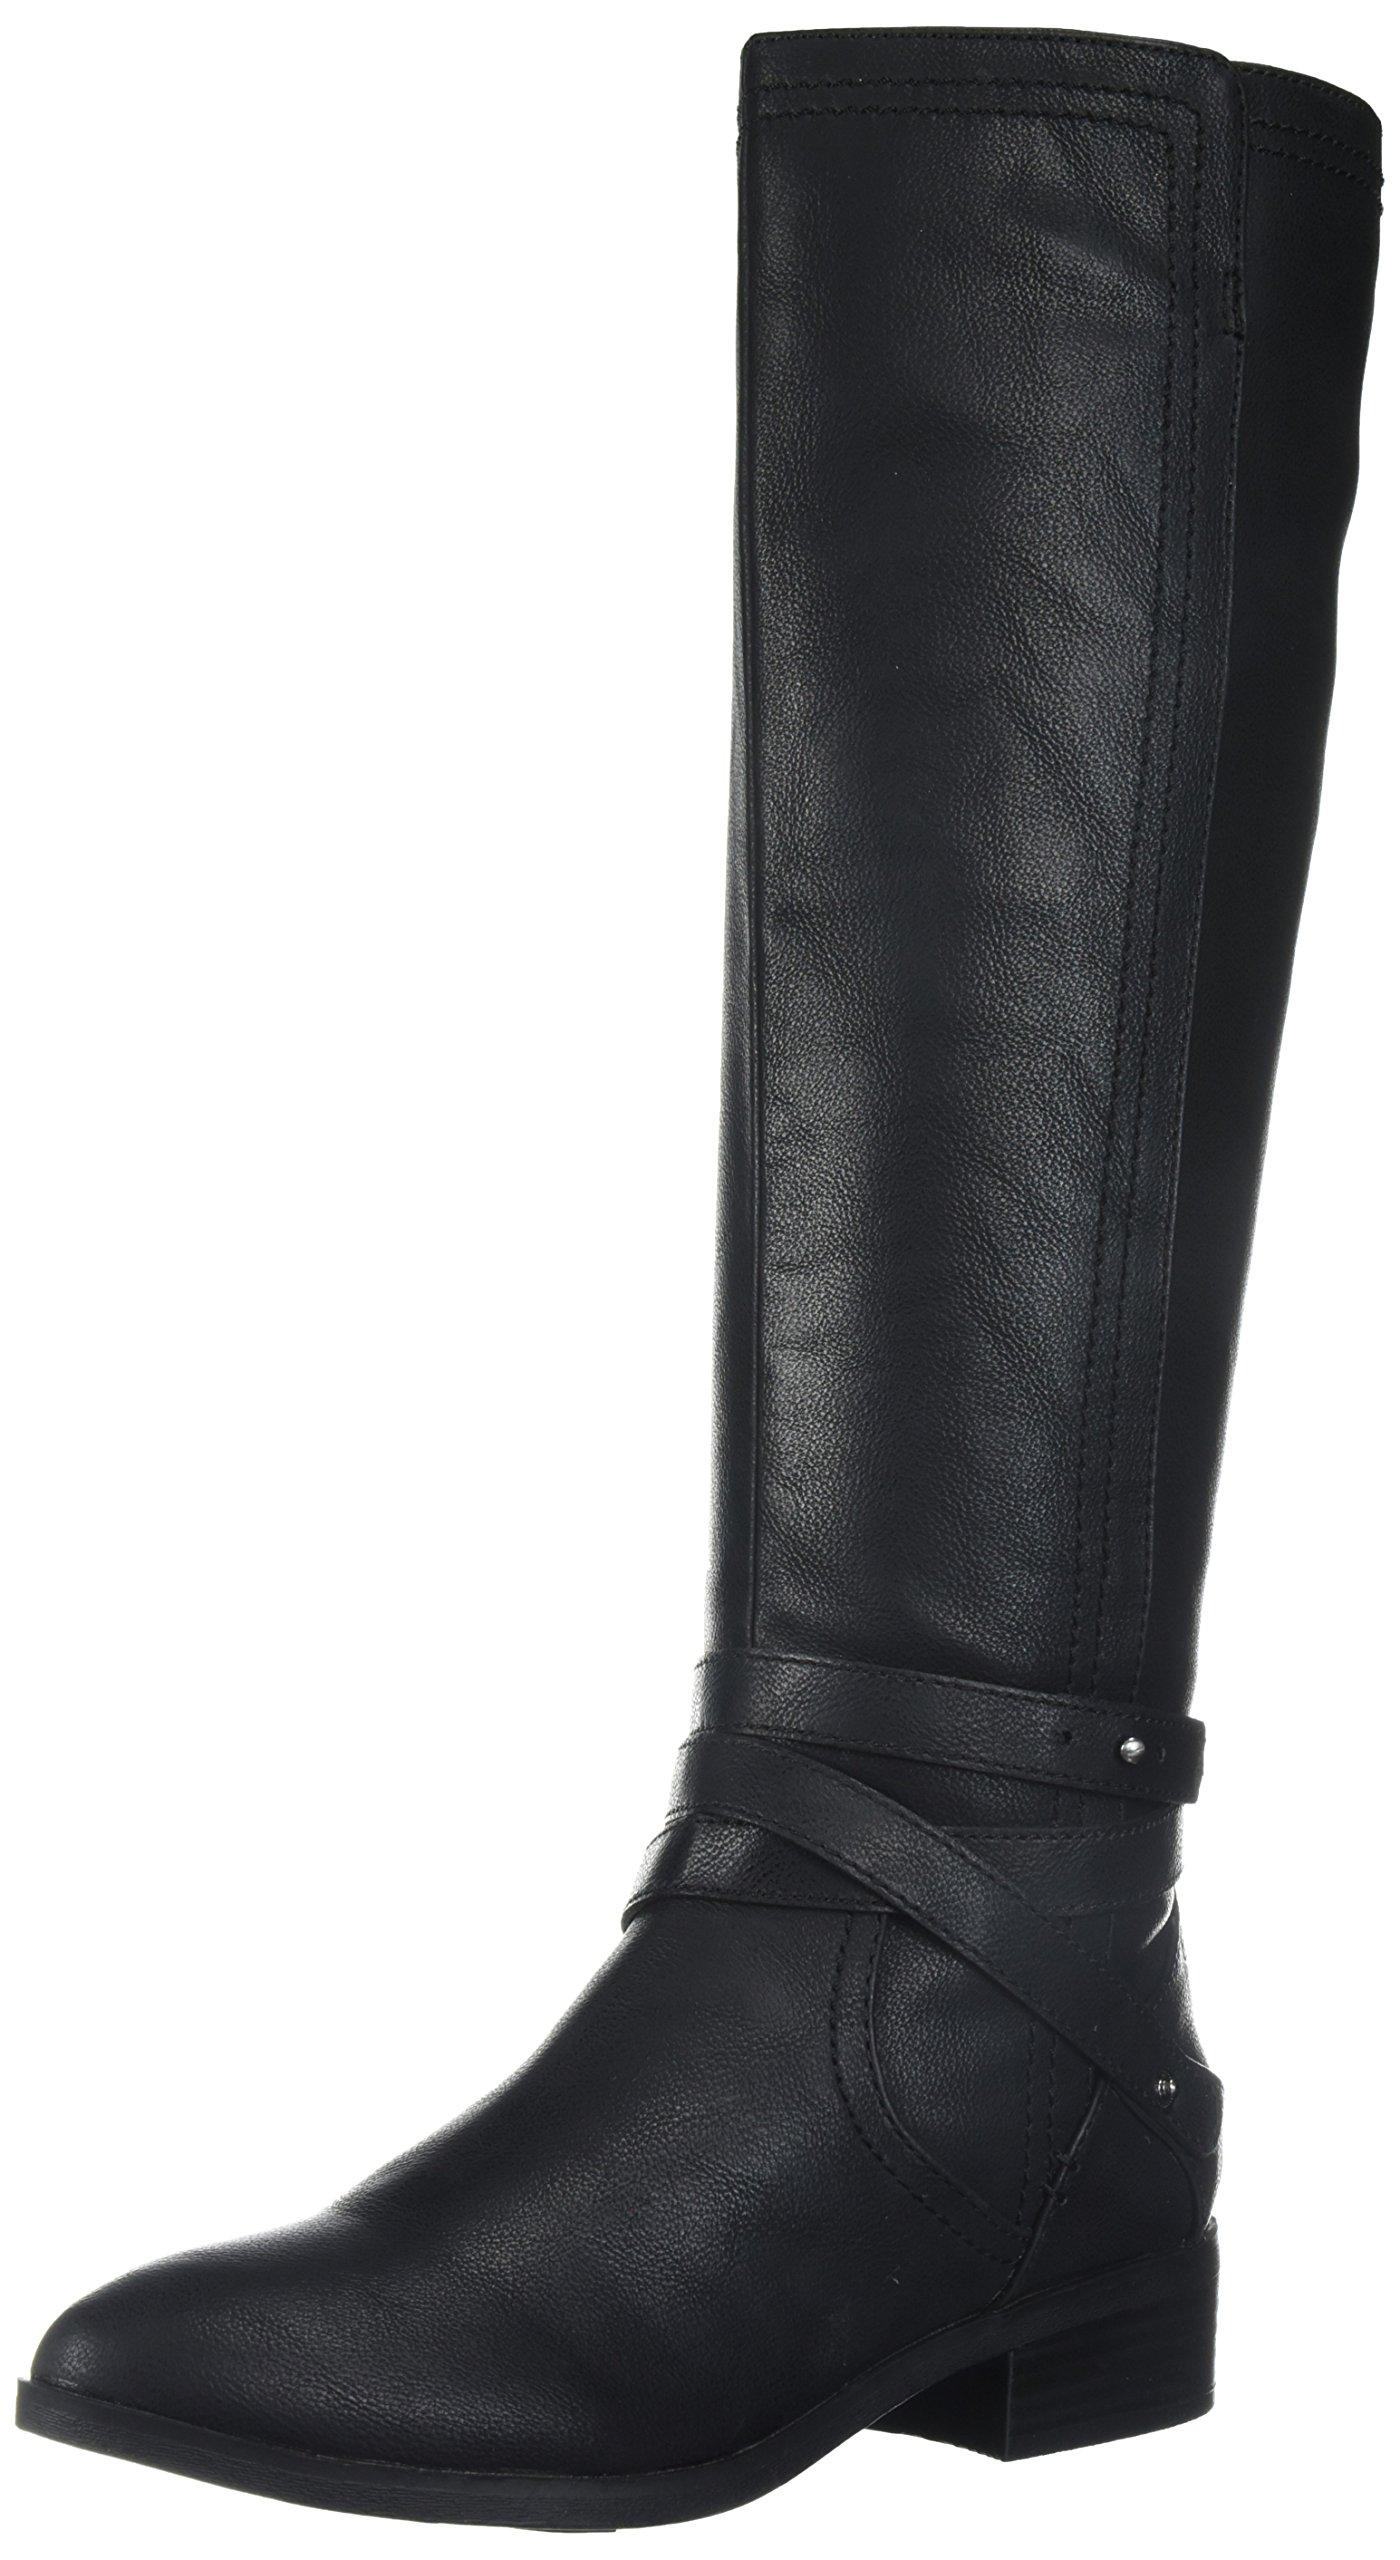 Fergalicious Women's Lennin Riding Boot, Black, 10 M US